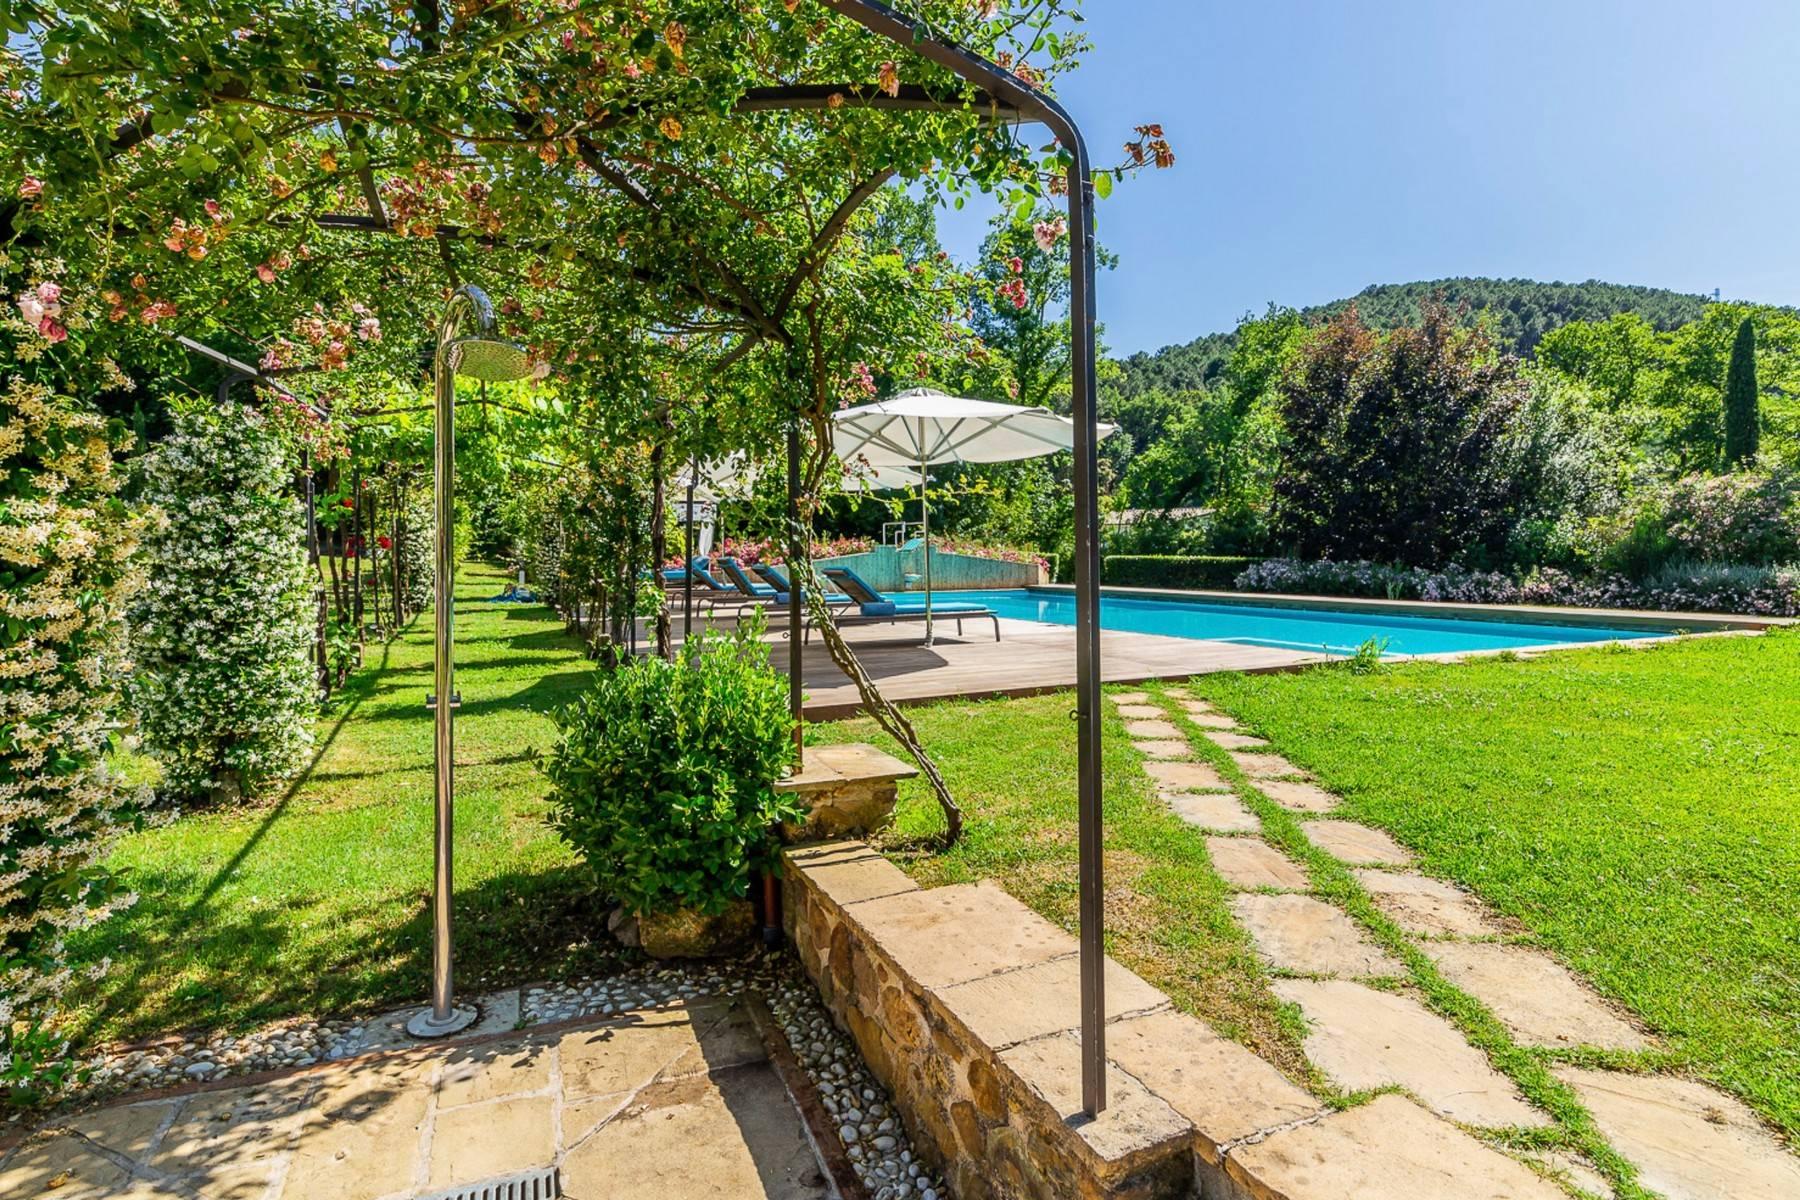 Villa in Vendita a Lucca: 5 locali, 1130 mq - Foto 28